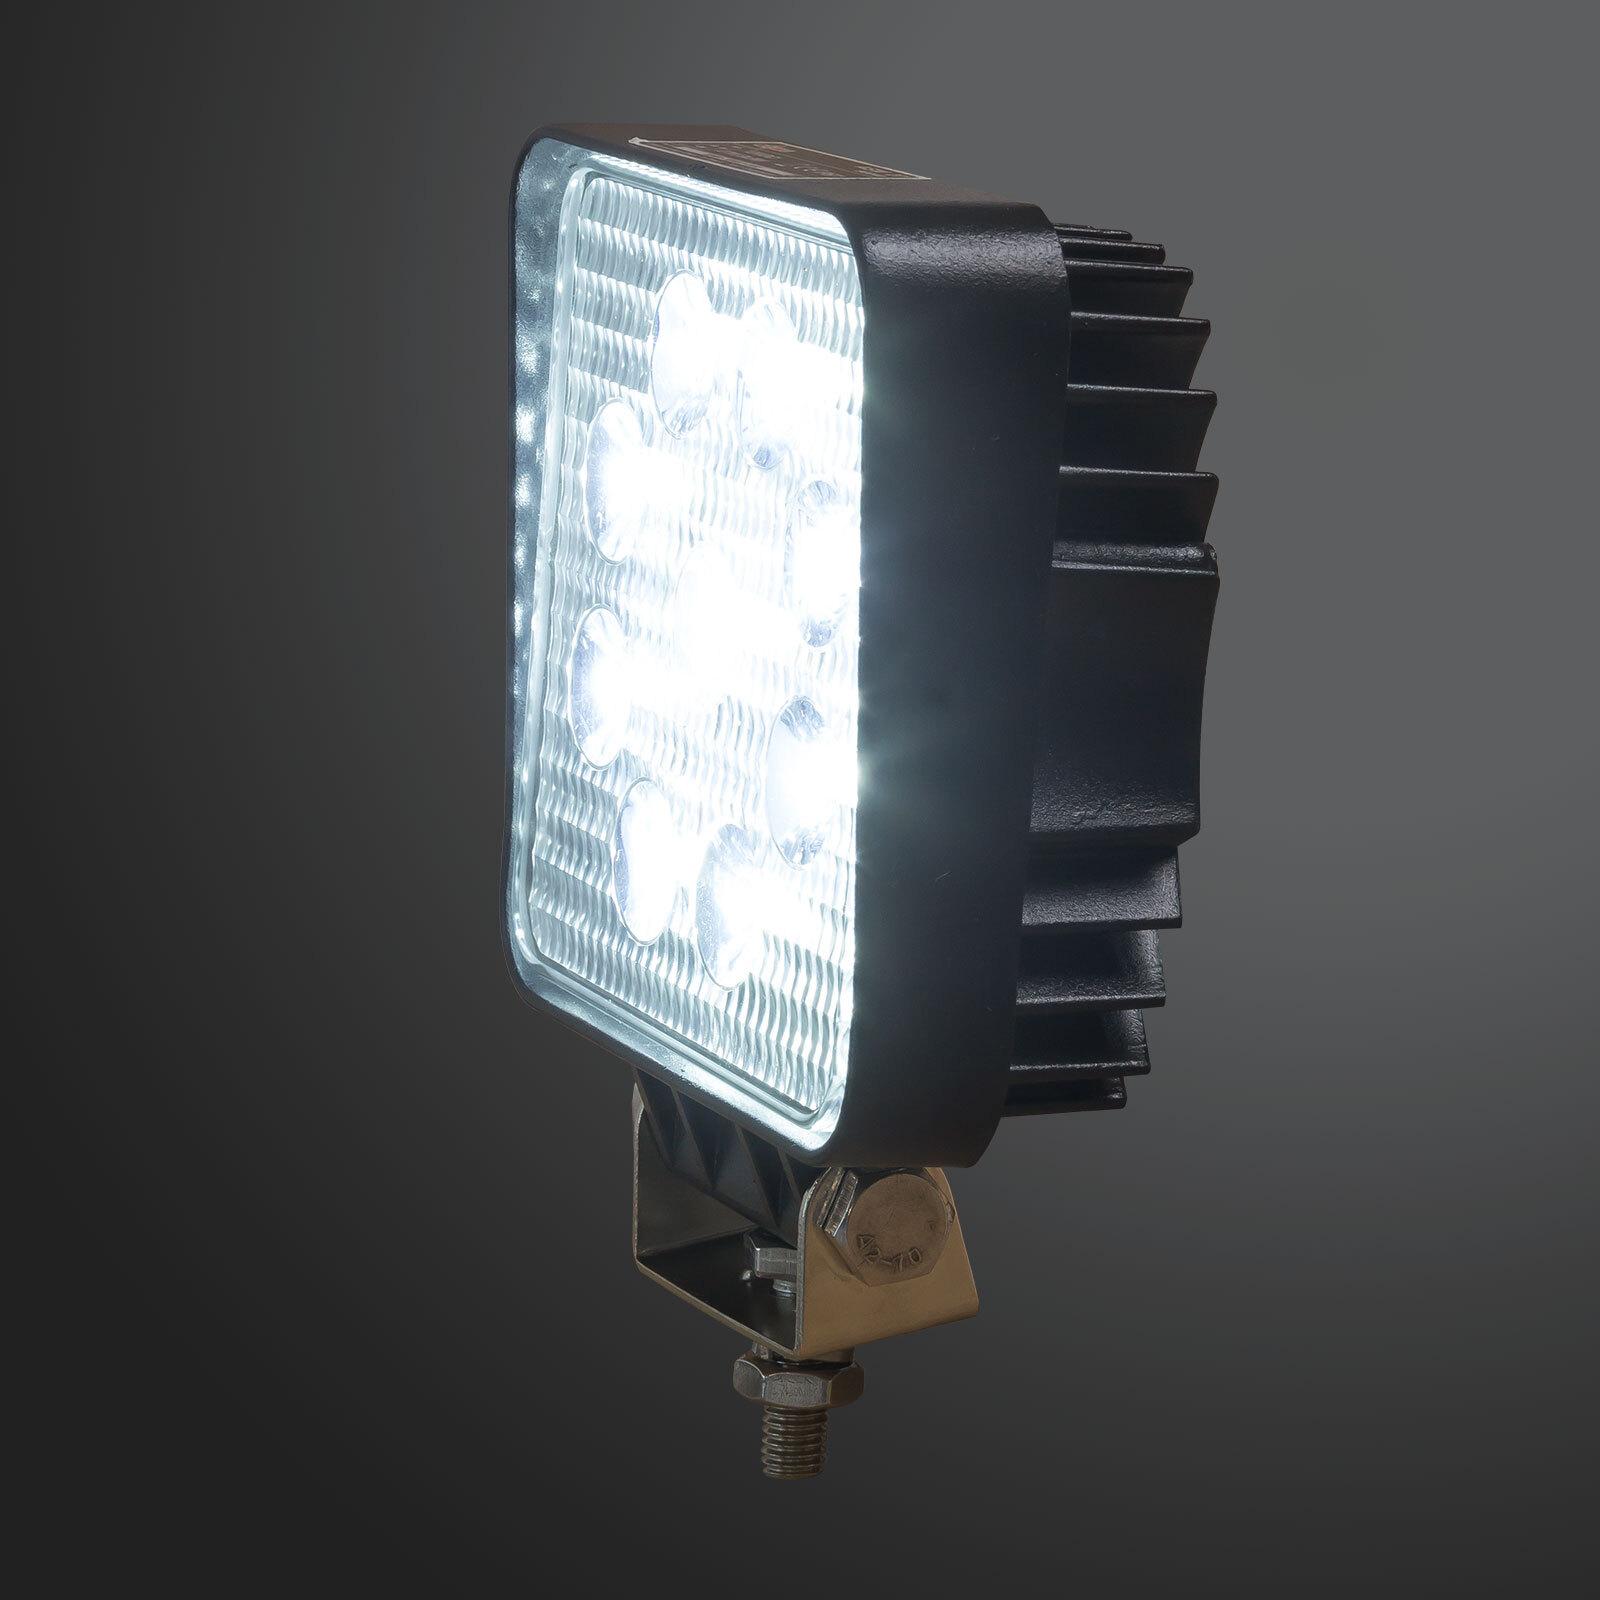 12 volt led arbeitsscheinwerfer arbeitsleuchte. Black Bedroom Furniture Sets. Home Design Ideas